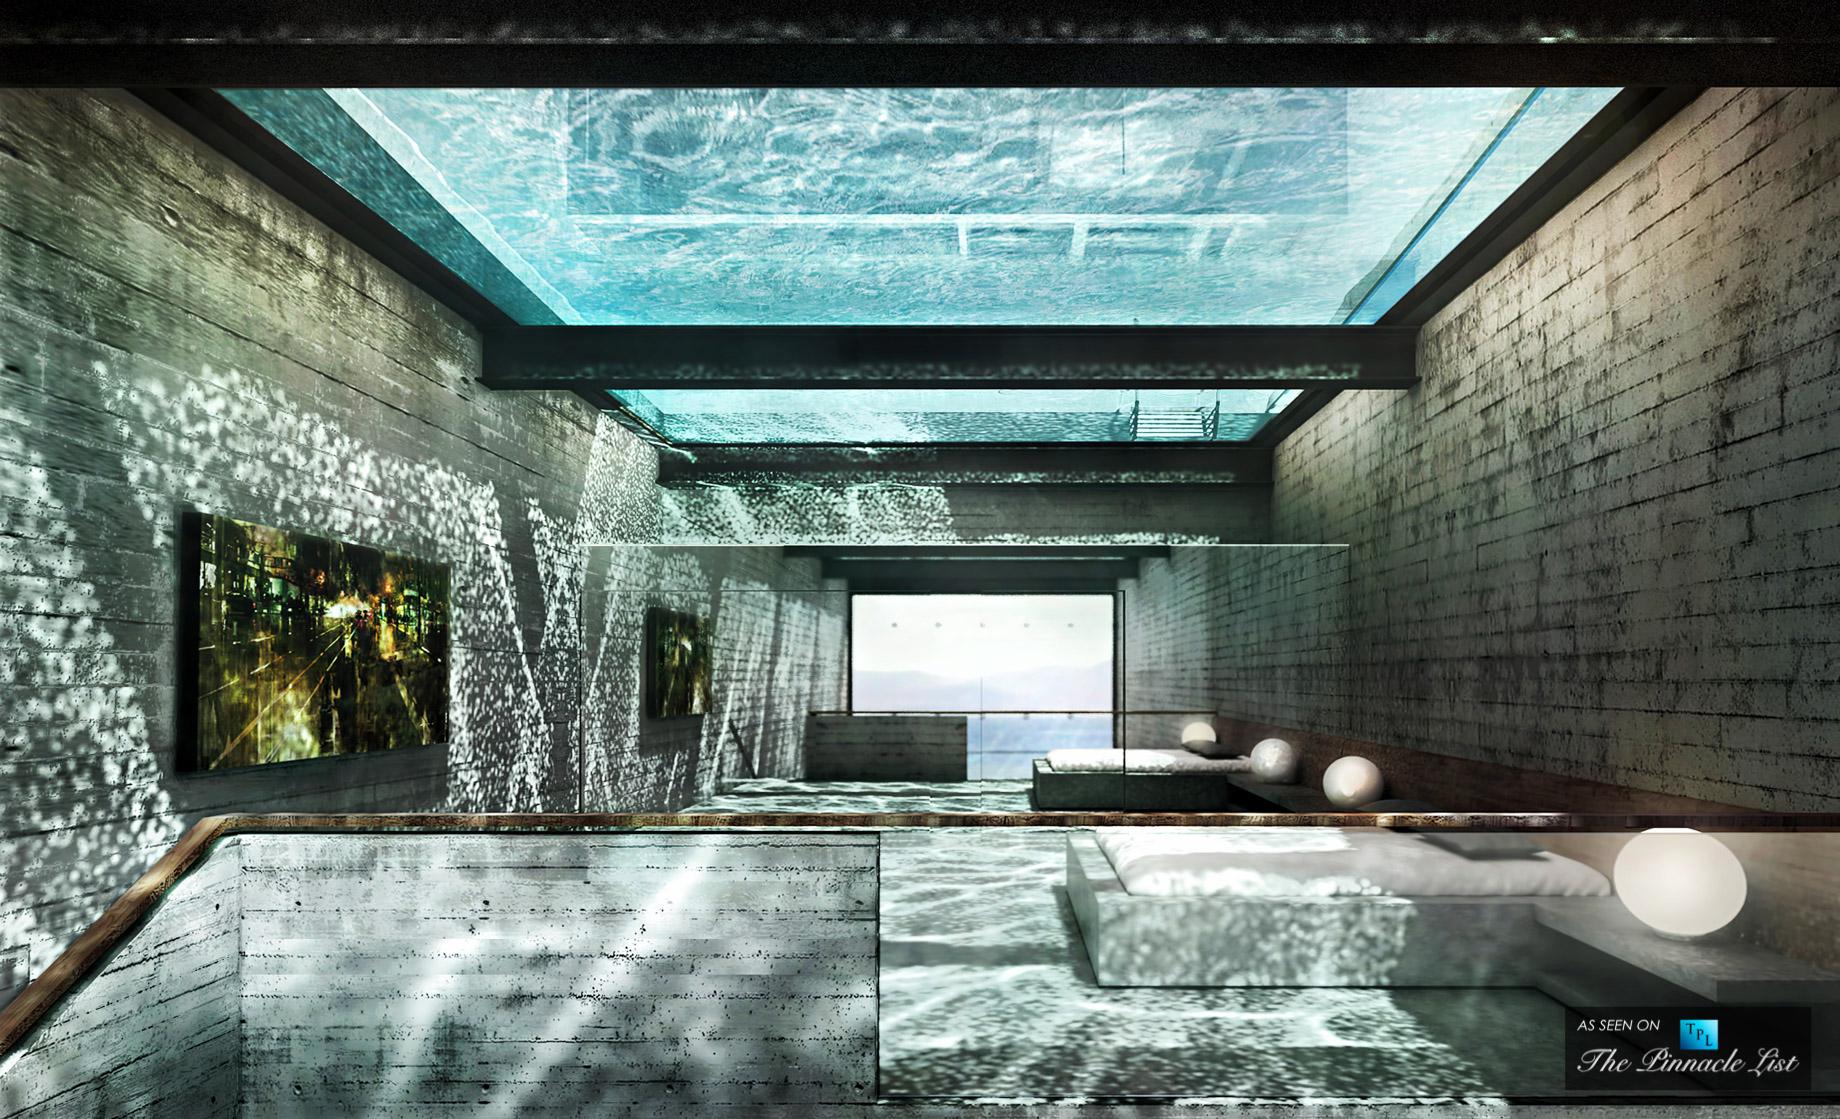 Imagine Living Inside a Cliff - Luxury Home Wedged Cliffside, Sunken Clifftop